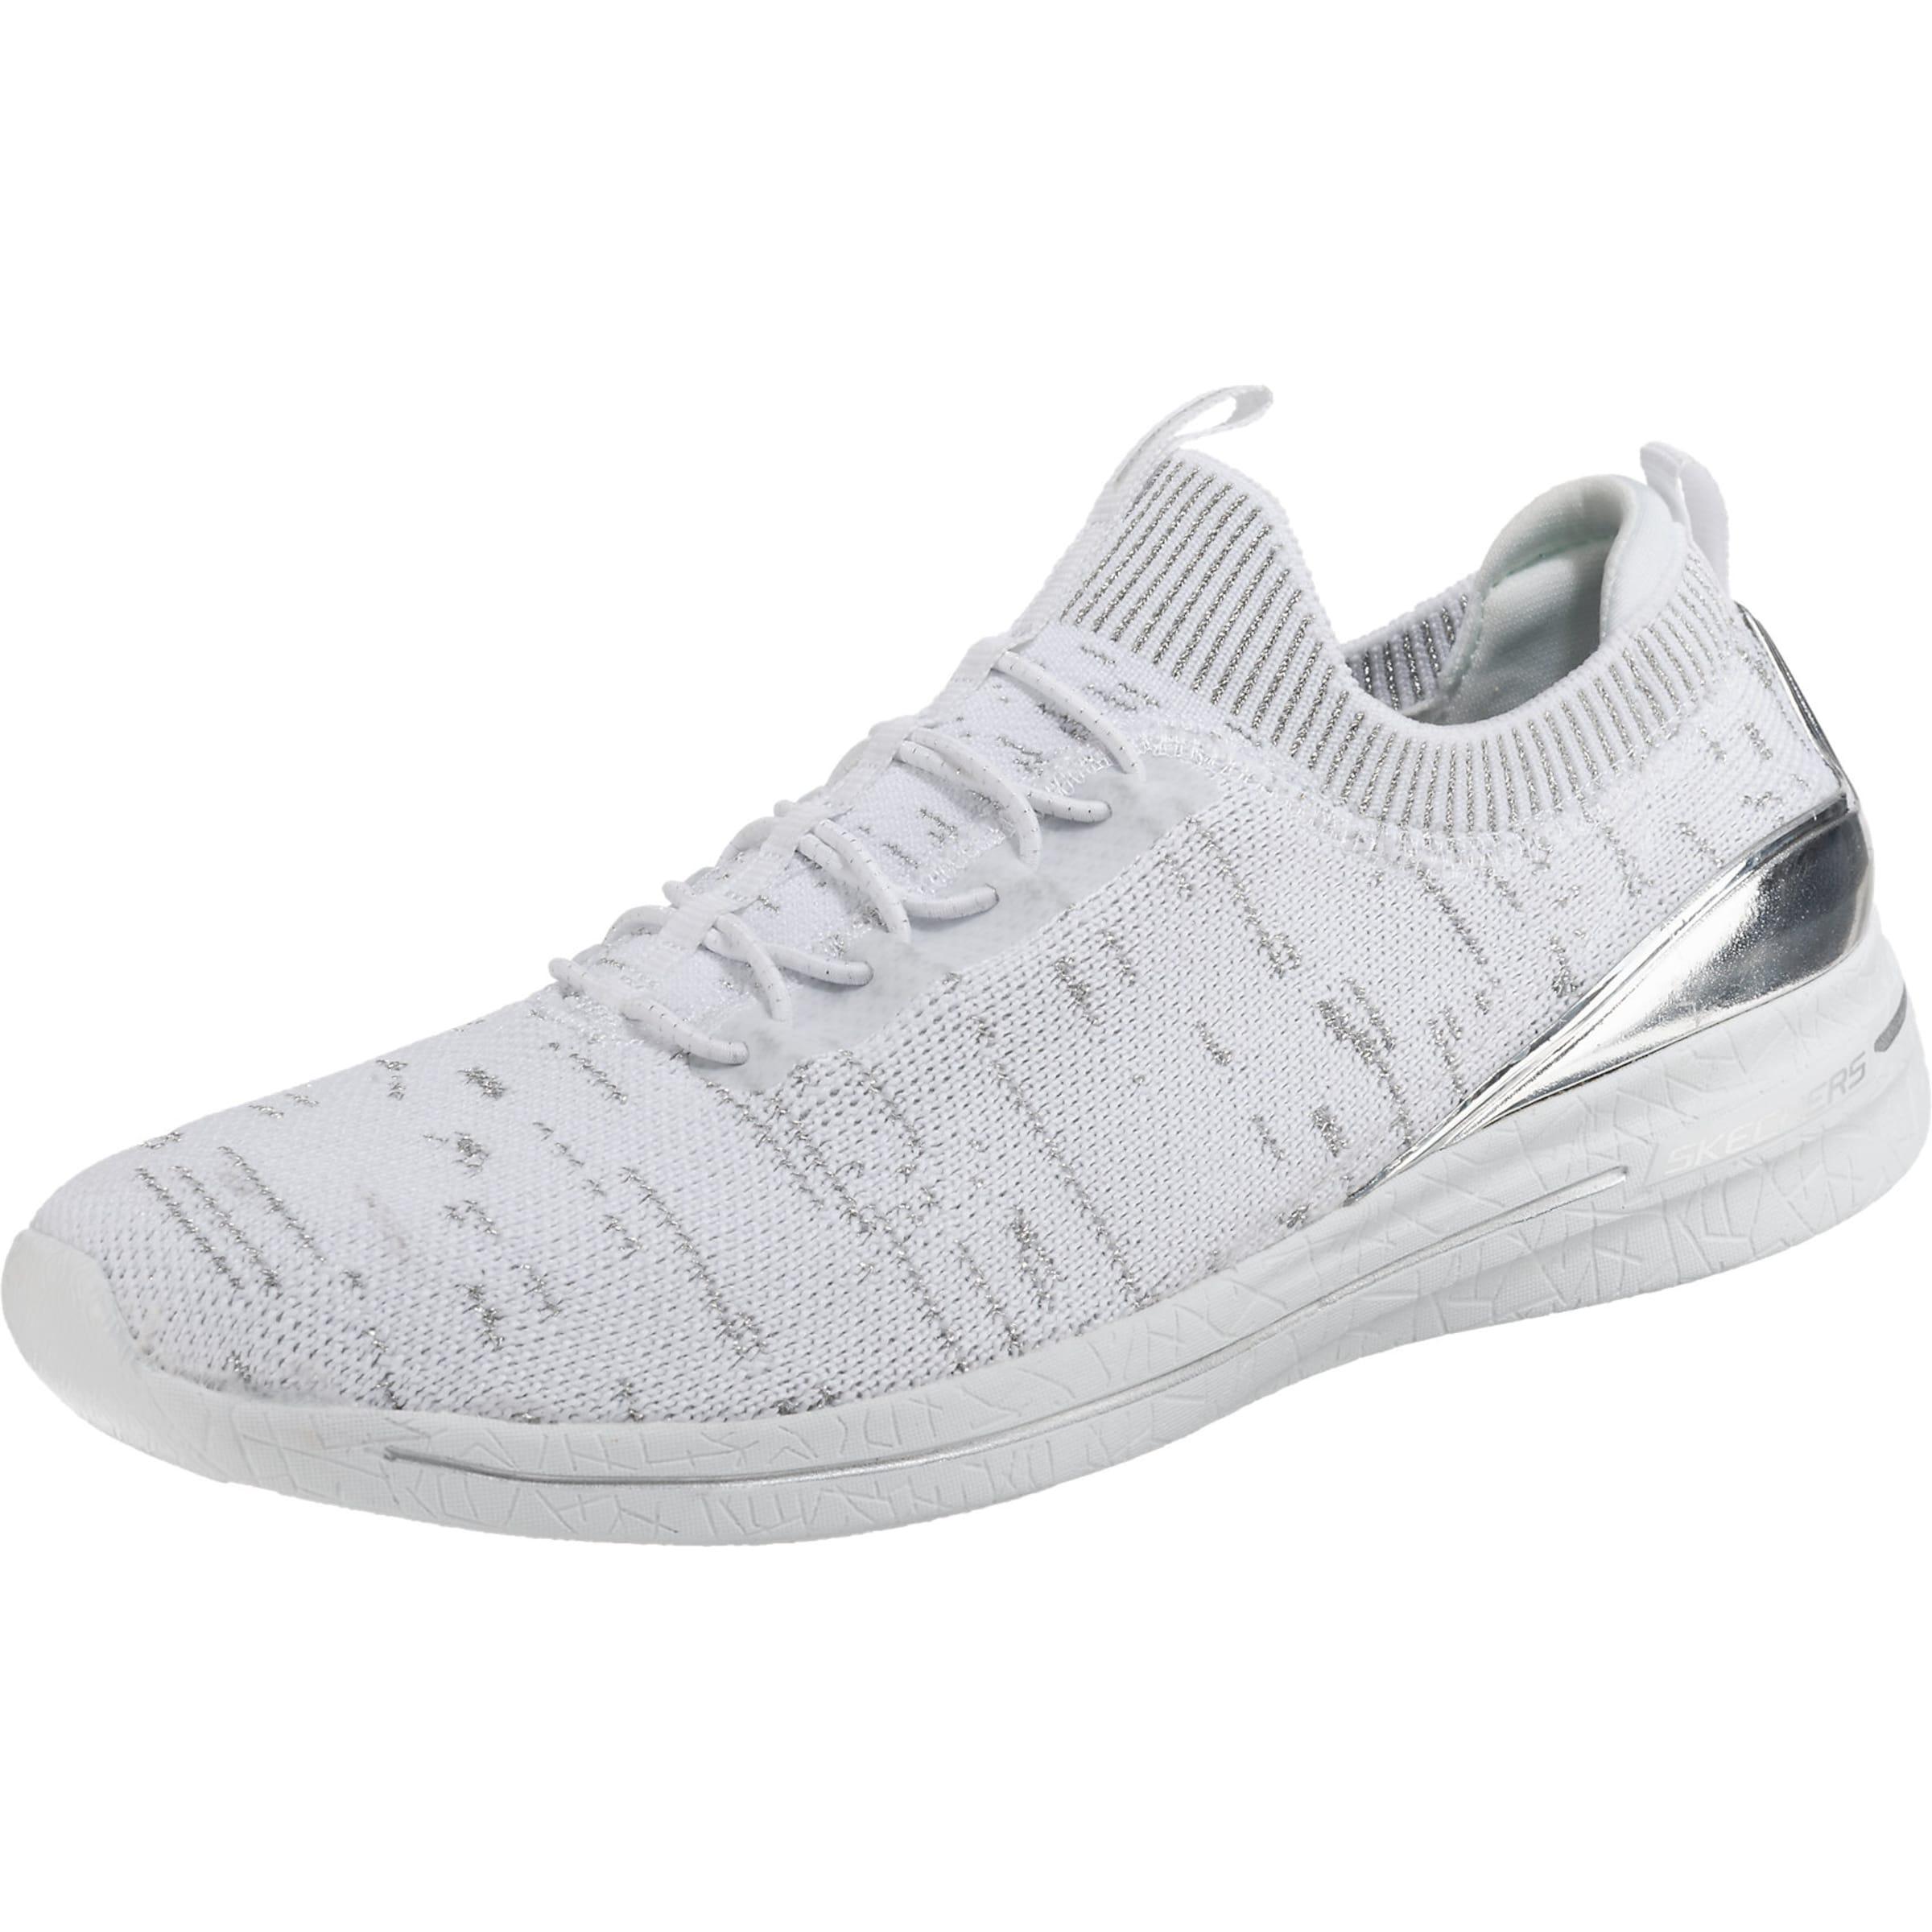 SKECHERS Sneakers Burst 2.0 Grand Fortune